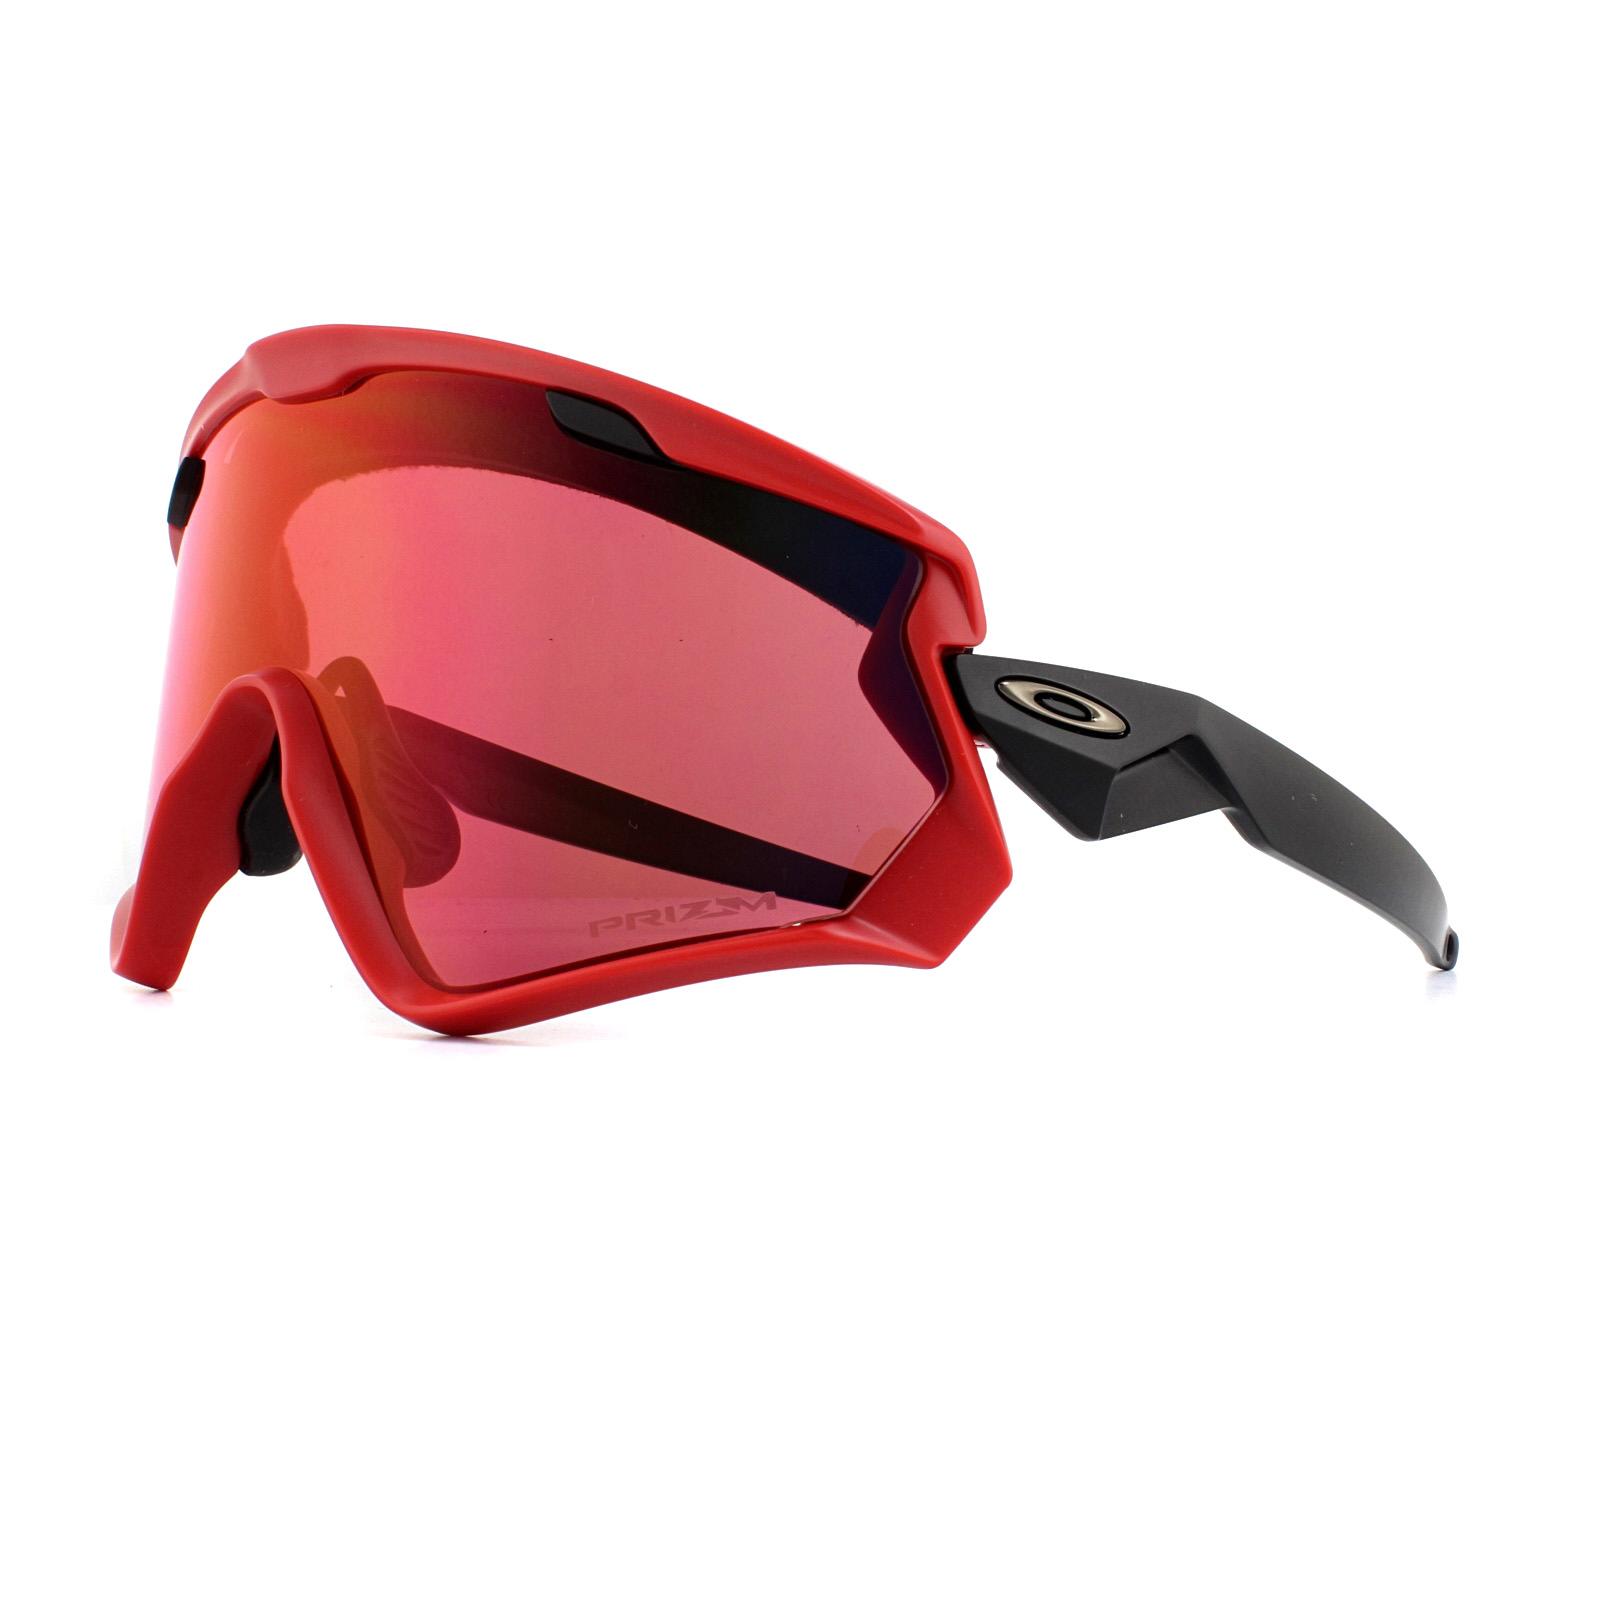 32ef80ea17cb9 Sentinel Oakley Ski Goggles Wind Jacket 2.0 OO9418-06 Viper Red Prizm Torch  Iridium